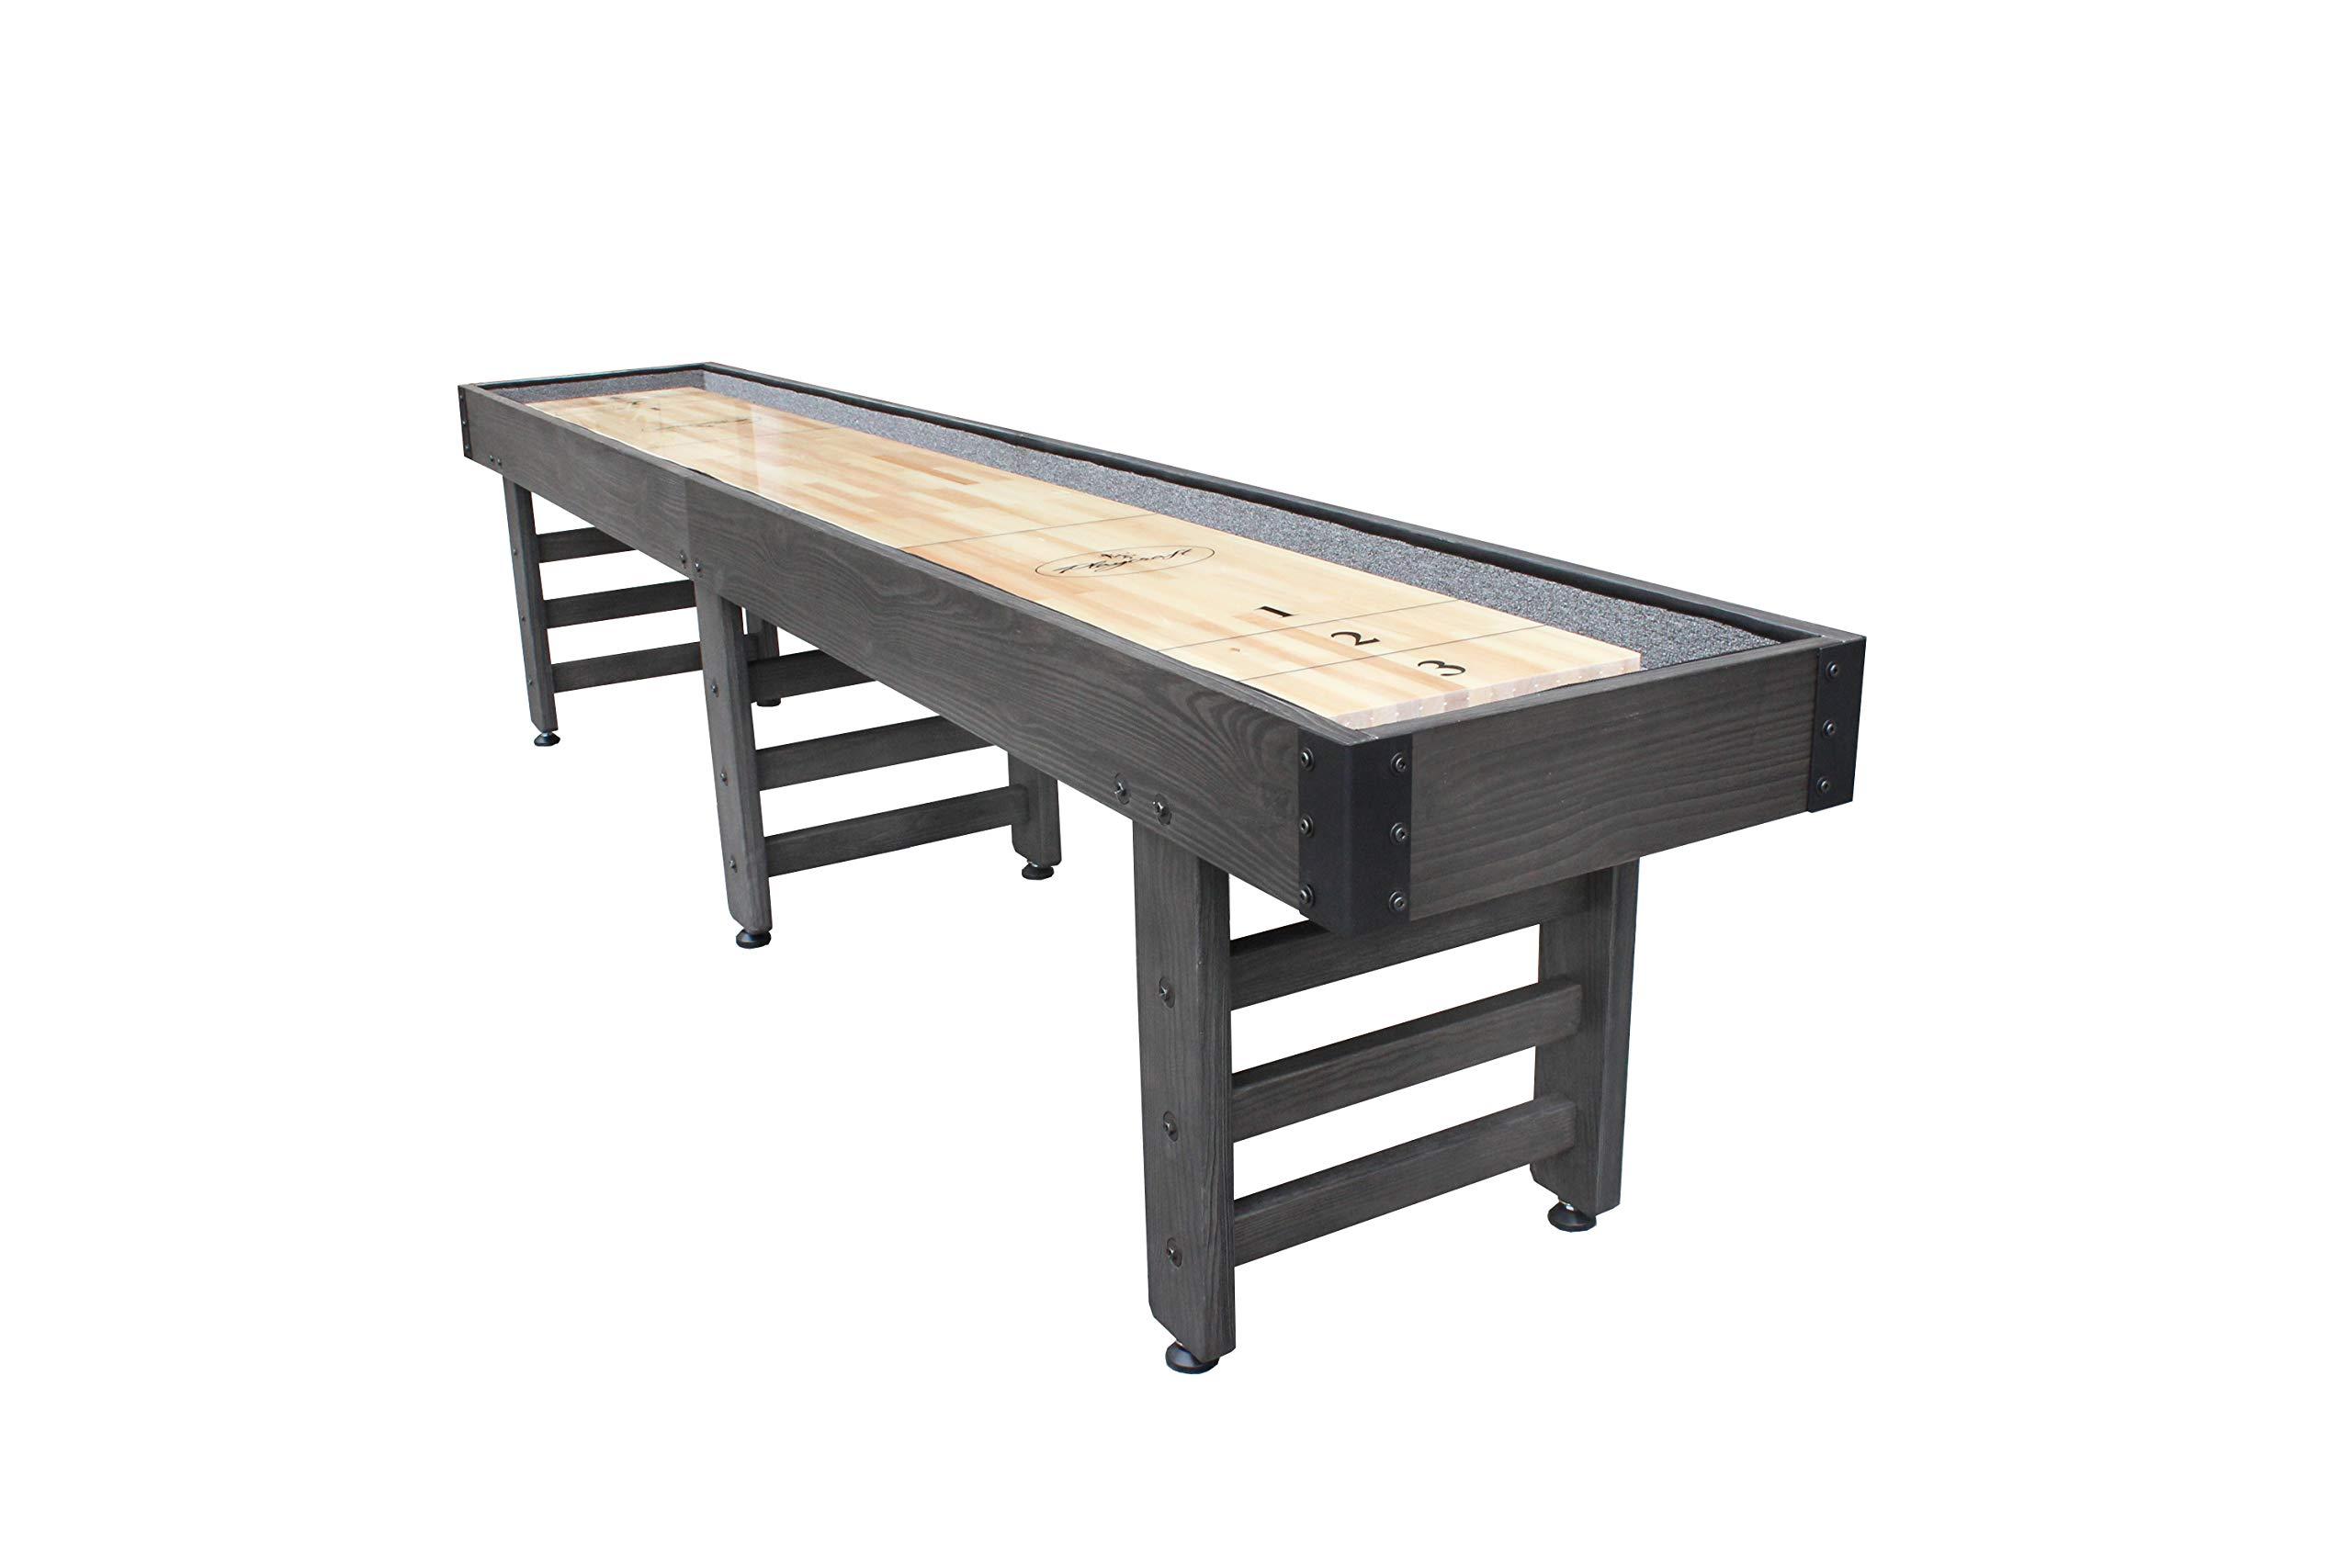 Playcraft Saybrook Midnight 14' Shuffleboard Table by Playcraft